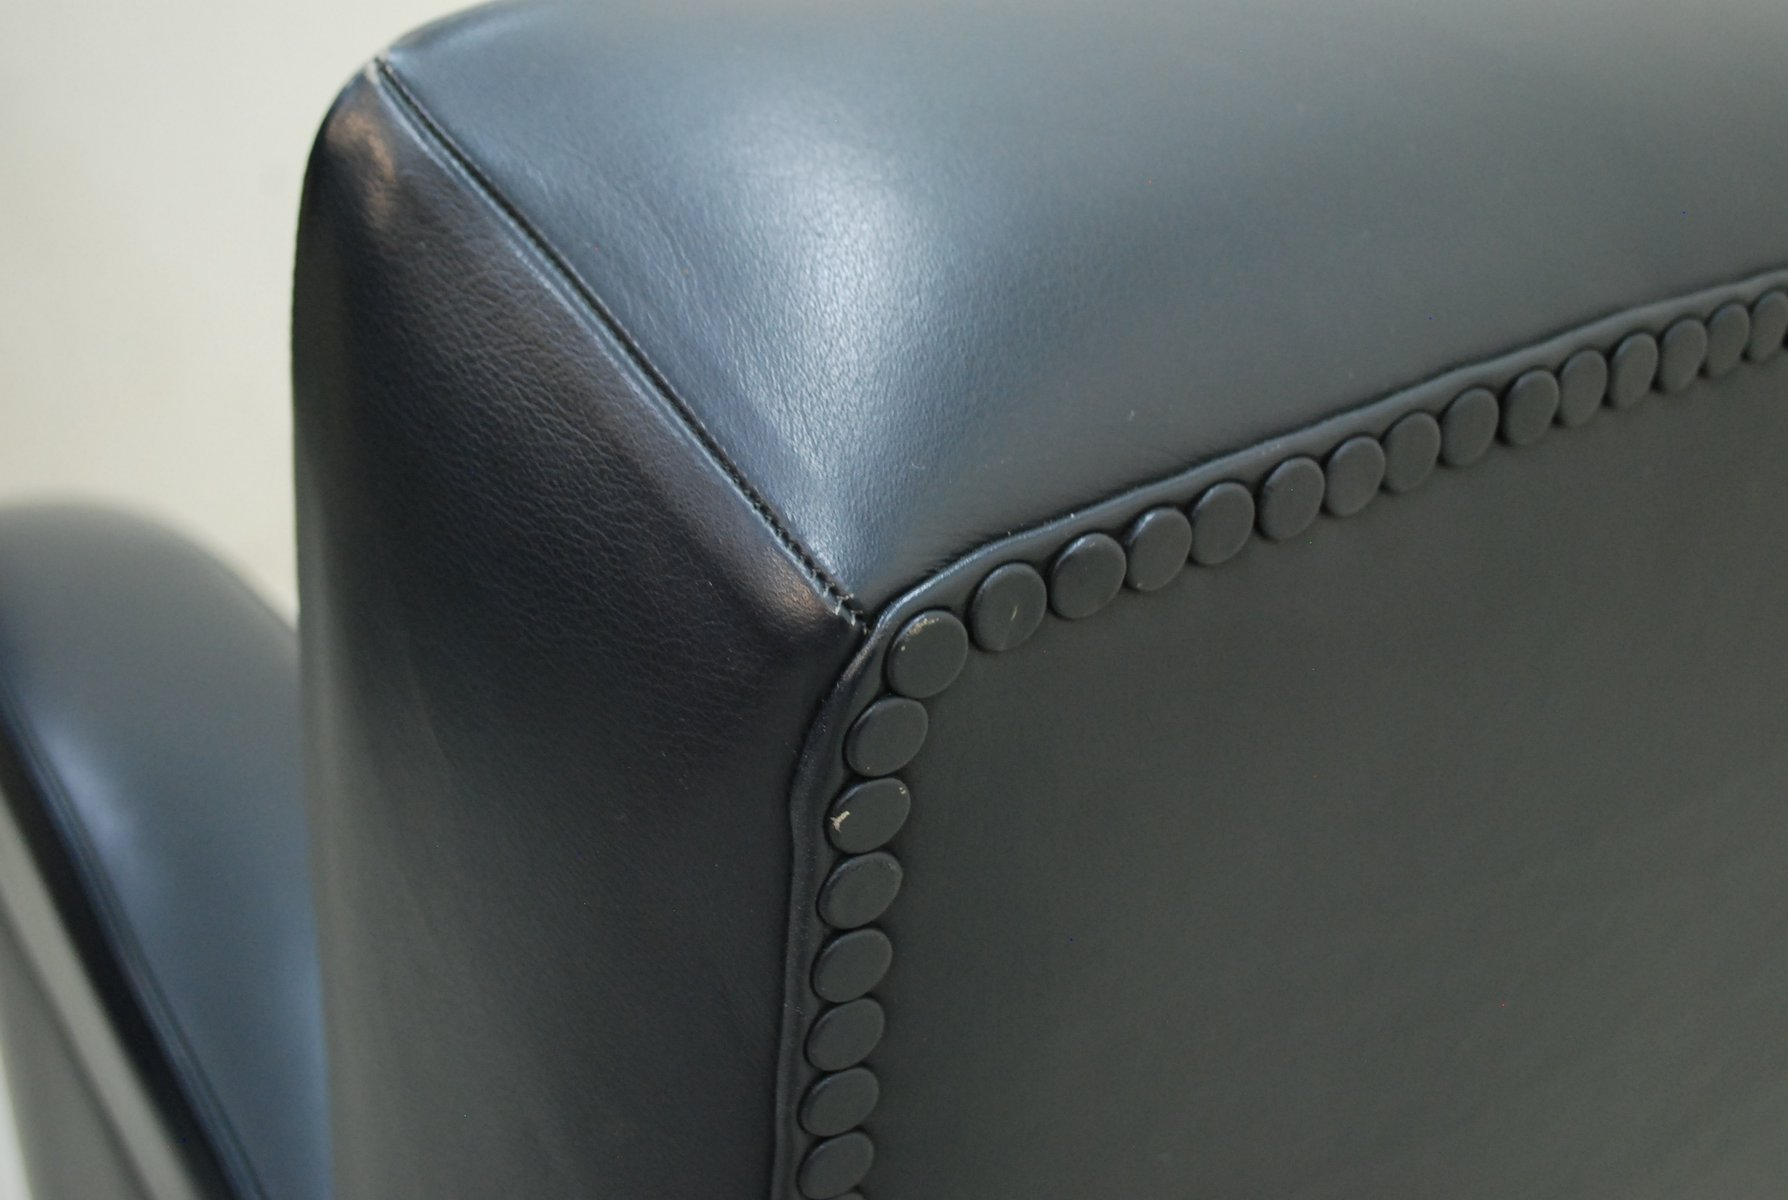 italienischer tabarin leder sessel von poltrona frau 1985. Black Bedroom Furniture Sets. Home Design Ideas